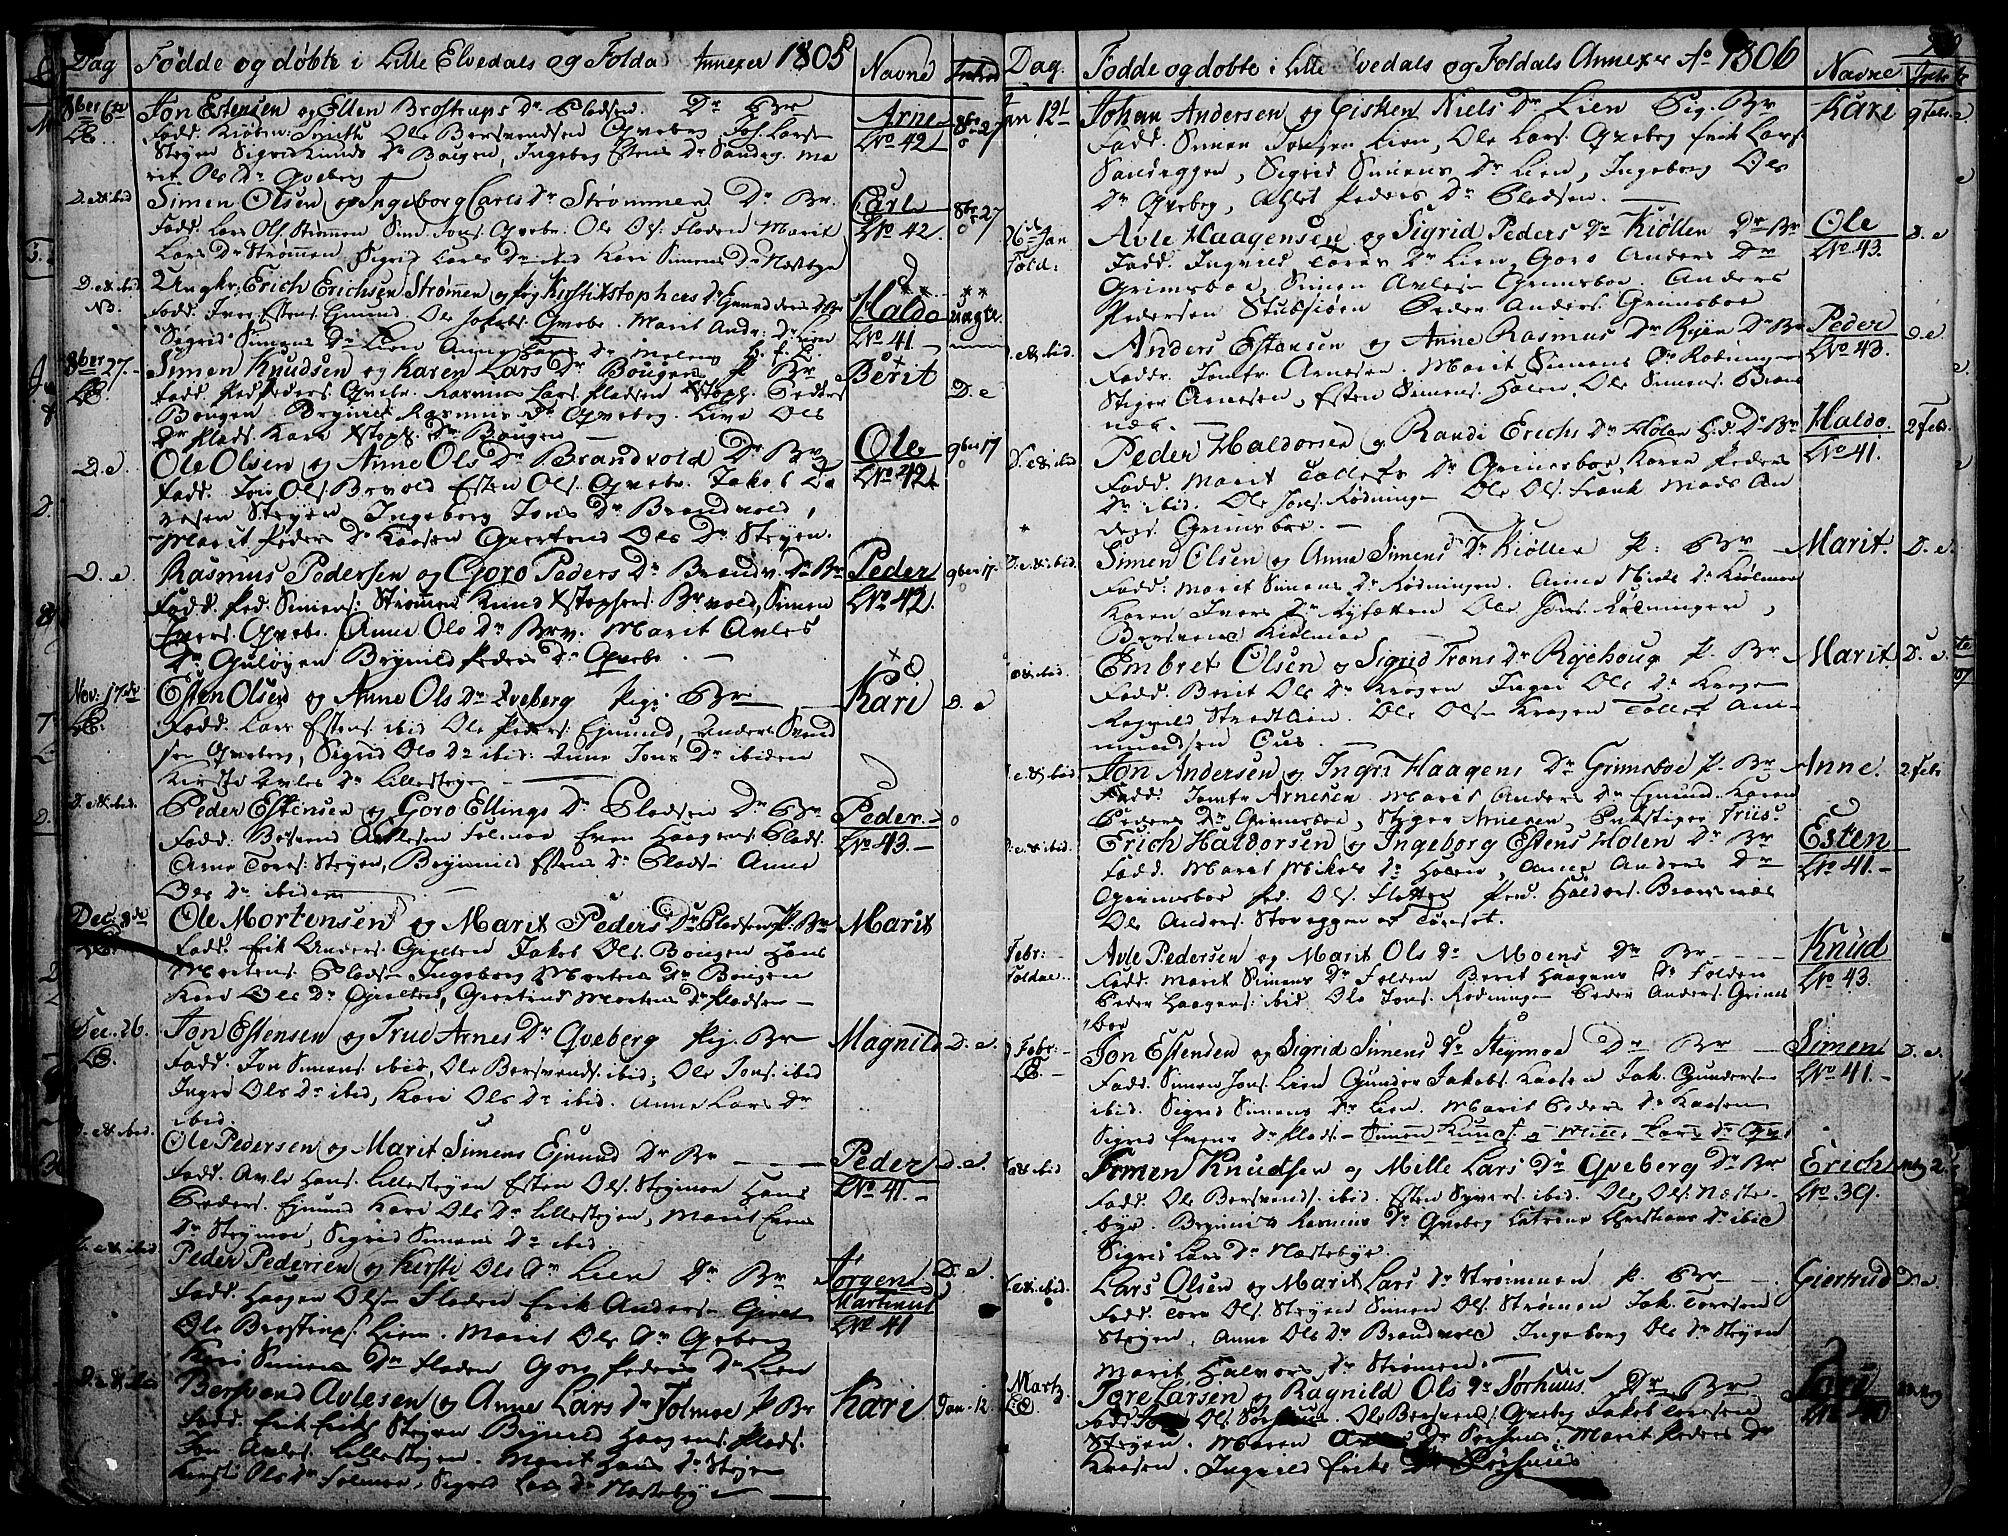 SAH, Tynset prestekontor, Ministerialbok nr. 16, 1801-1814, s. 9